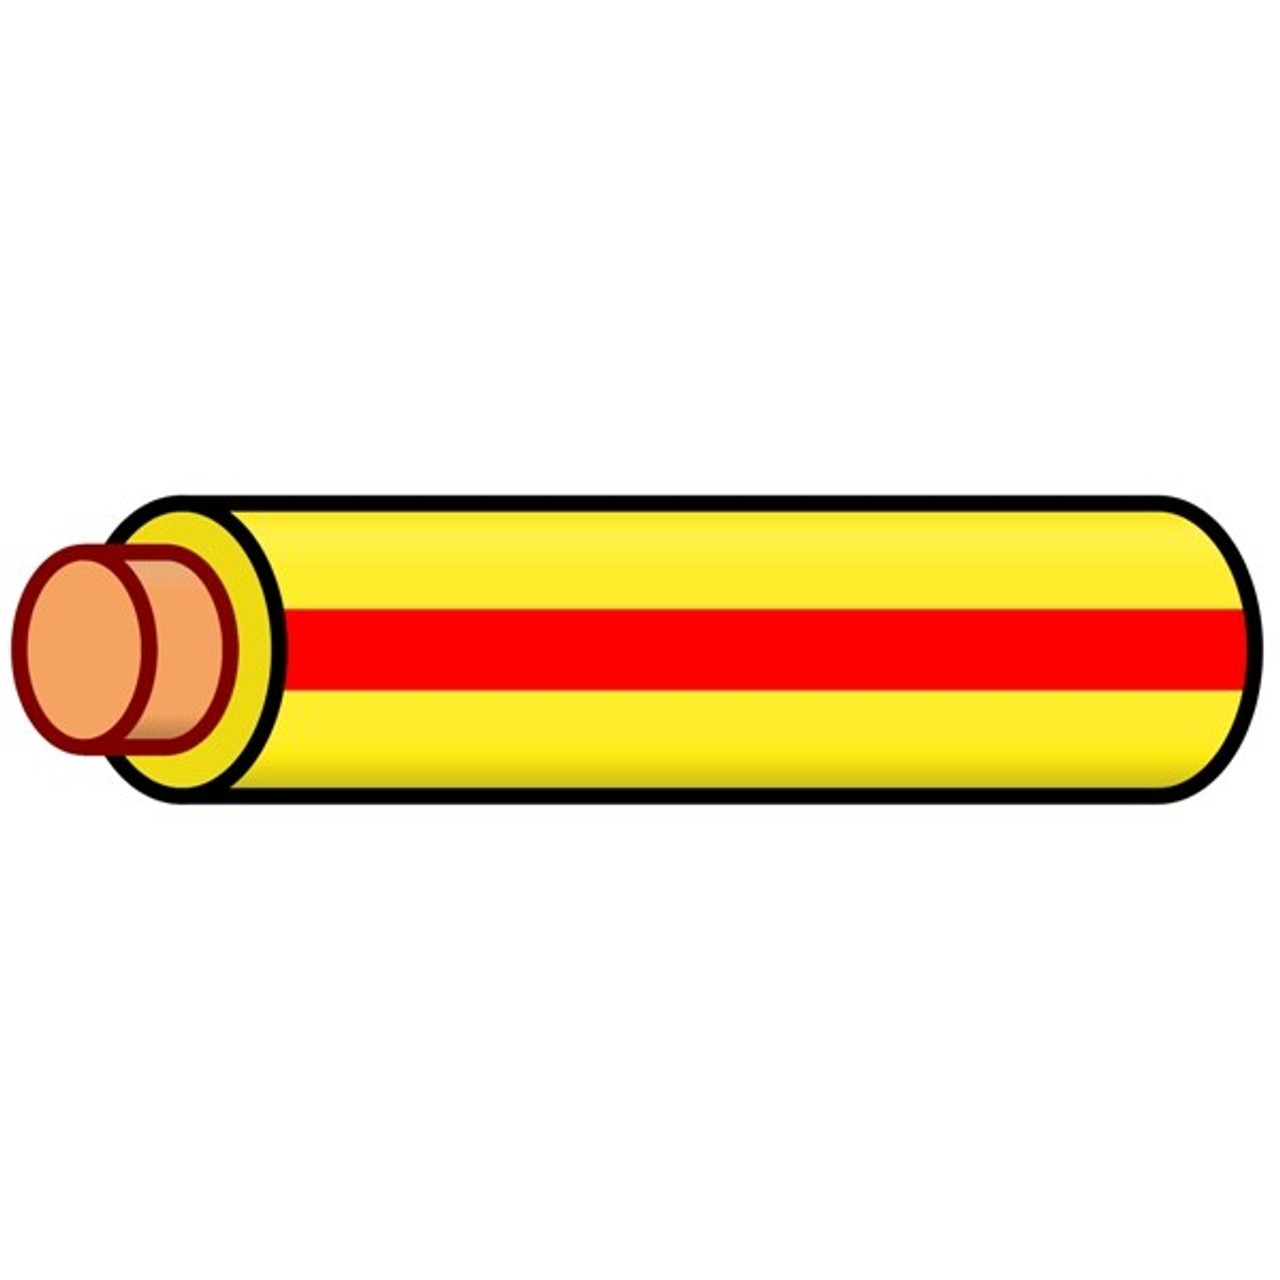 K4 Auto & Marine Primary Electrical Wire Yellow W/Red Stripe 14 ...